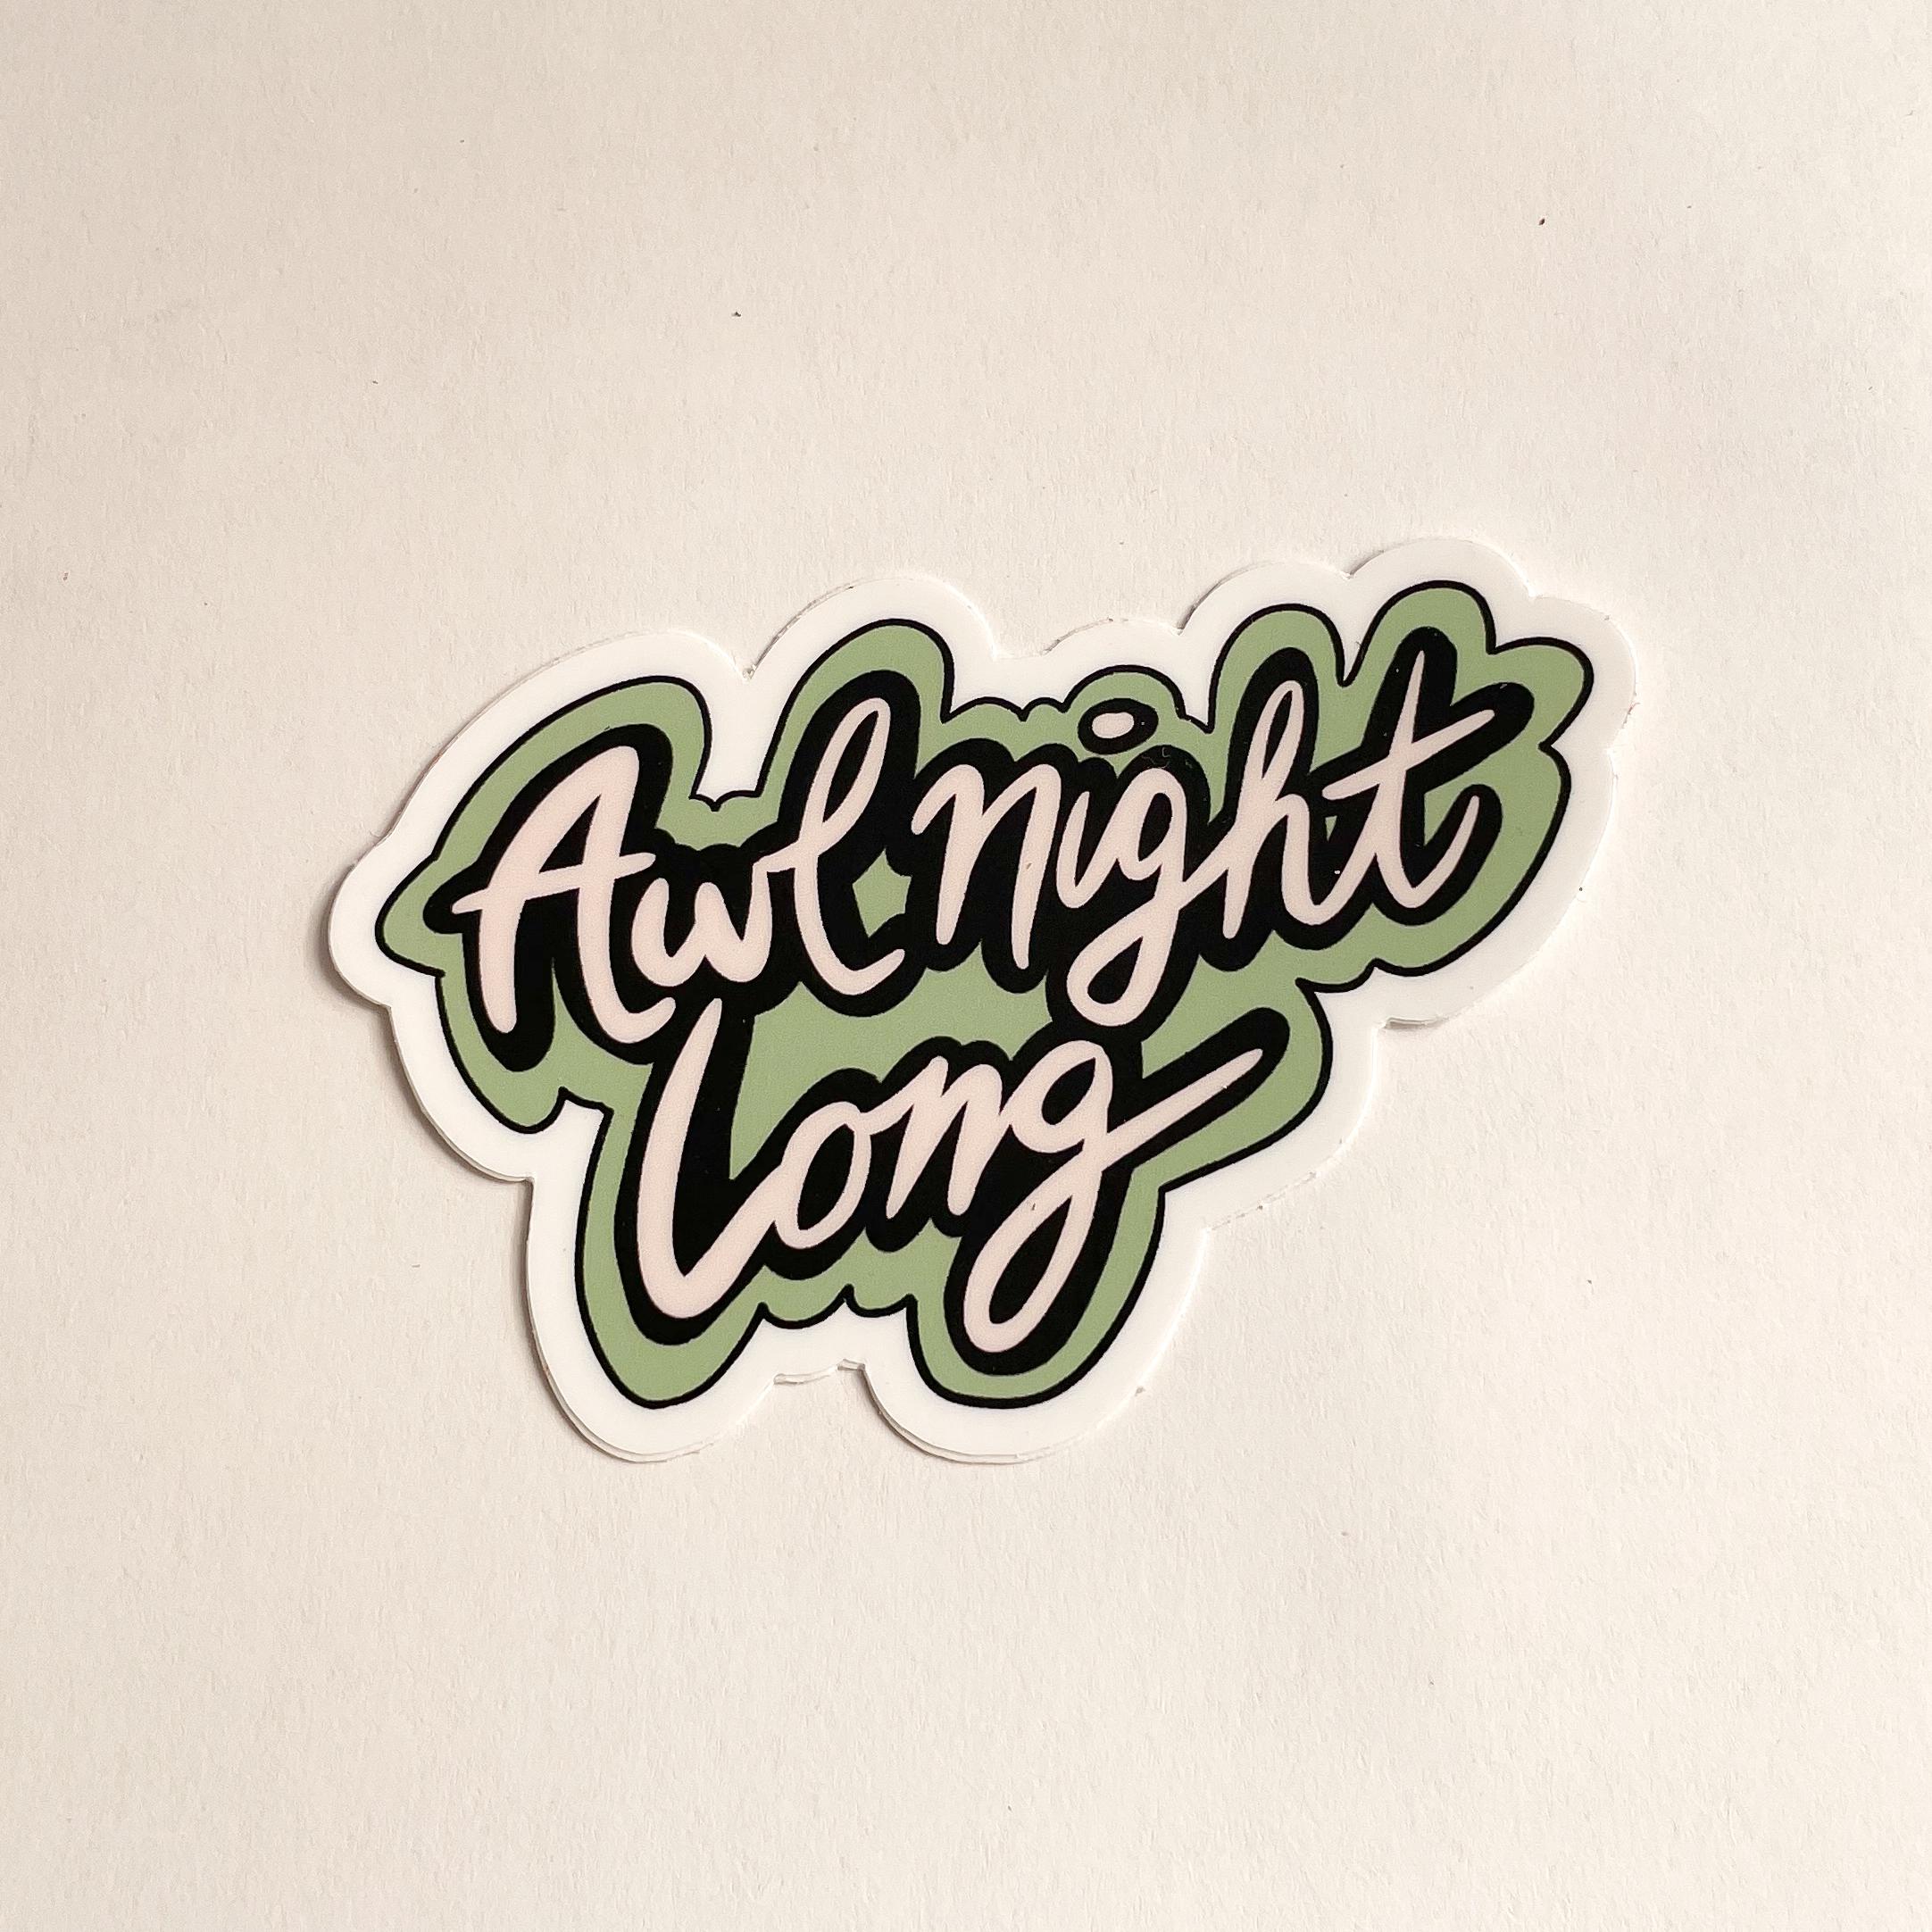 Awl Night Long sticker in handwriting